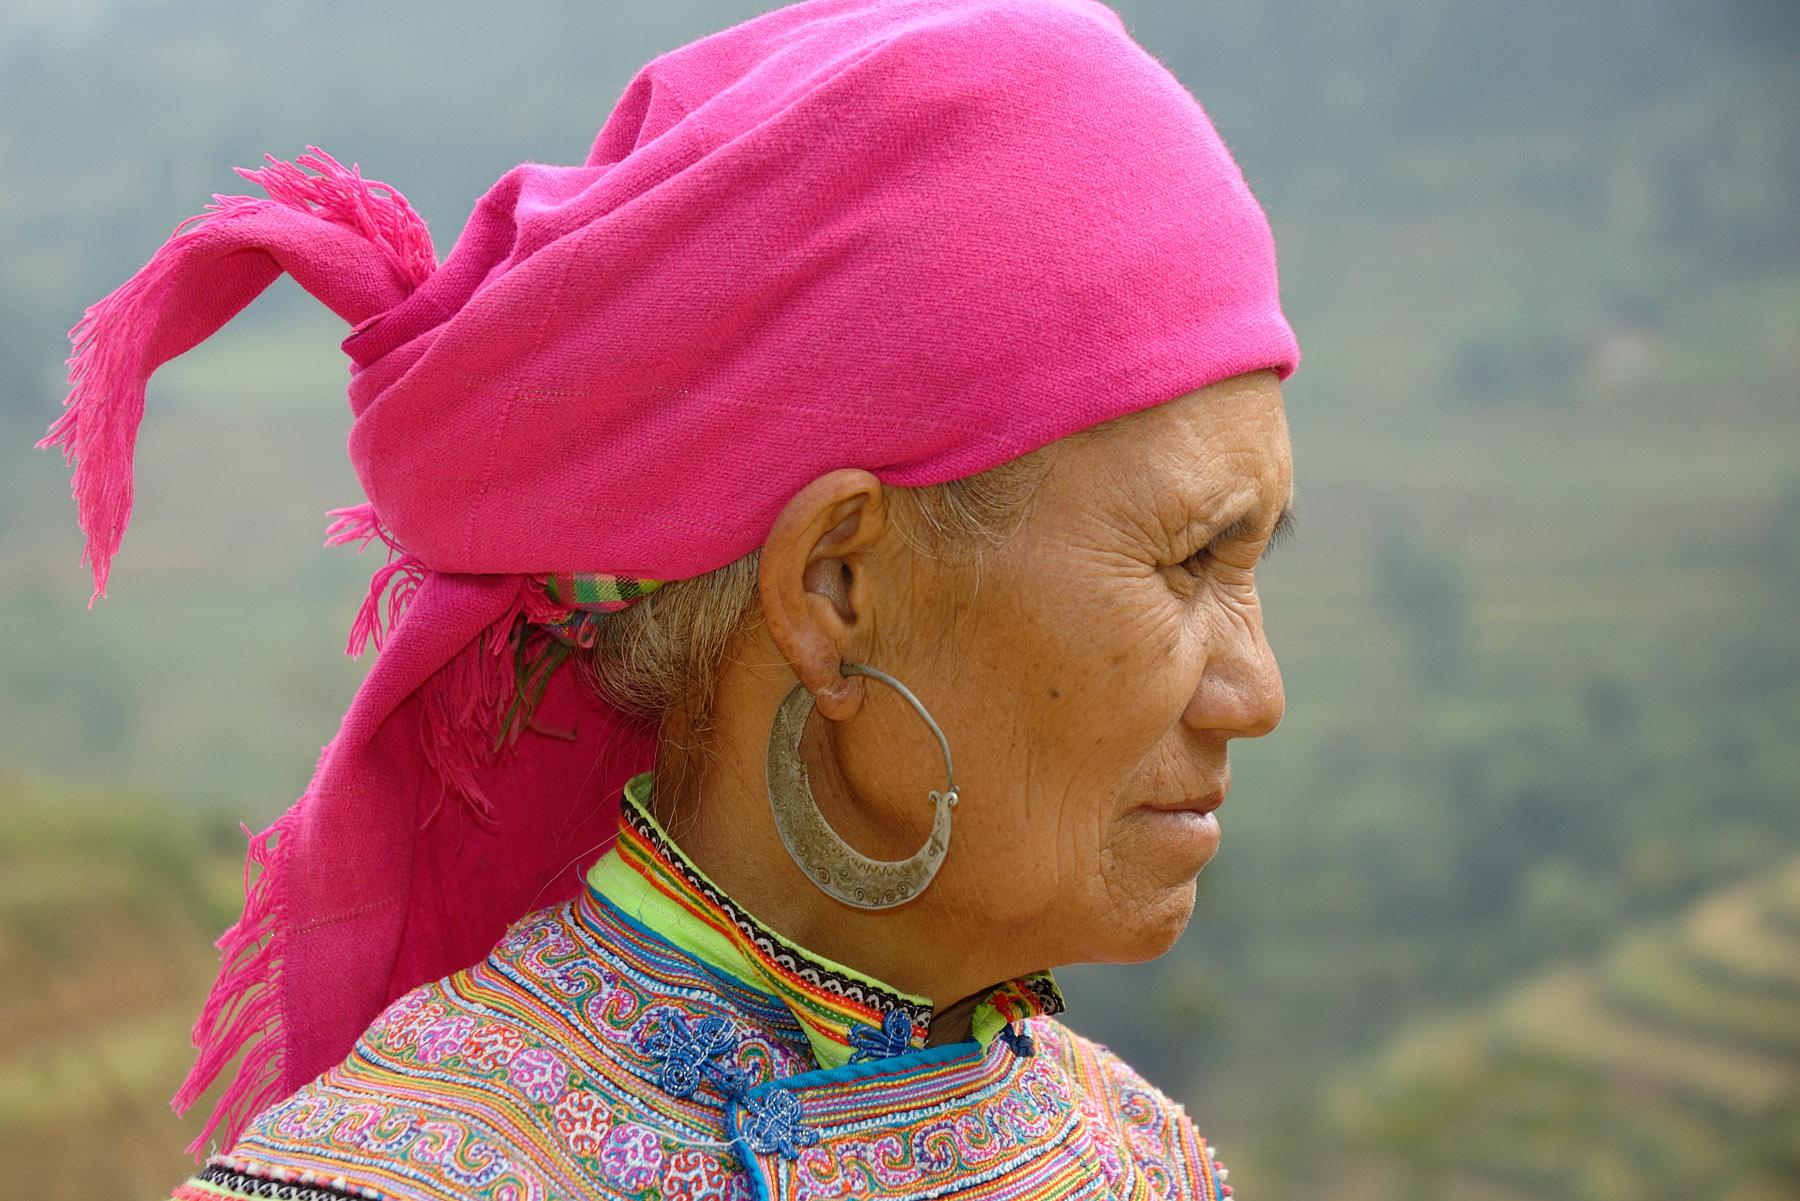 girl hmong names